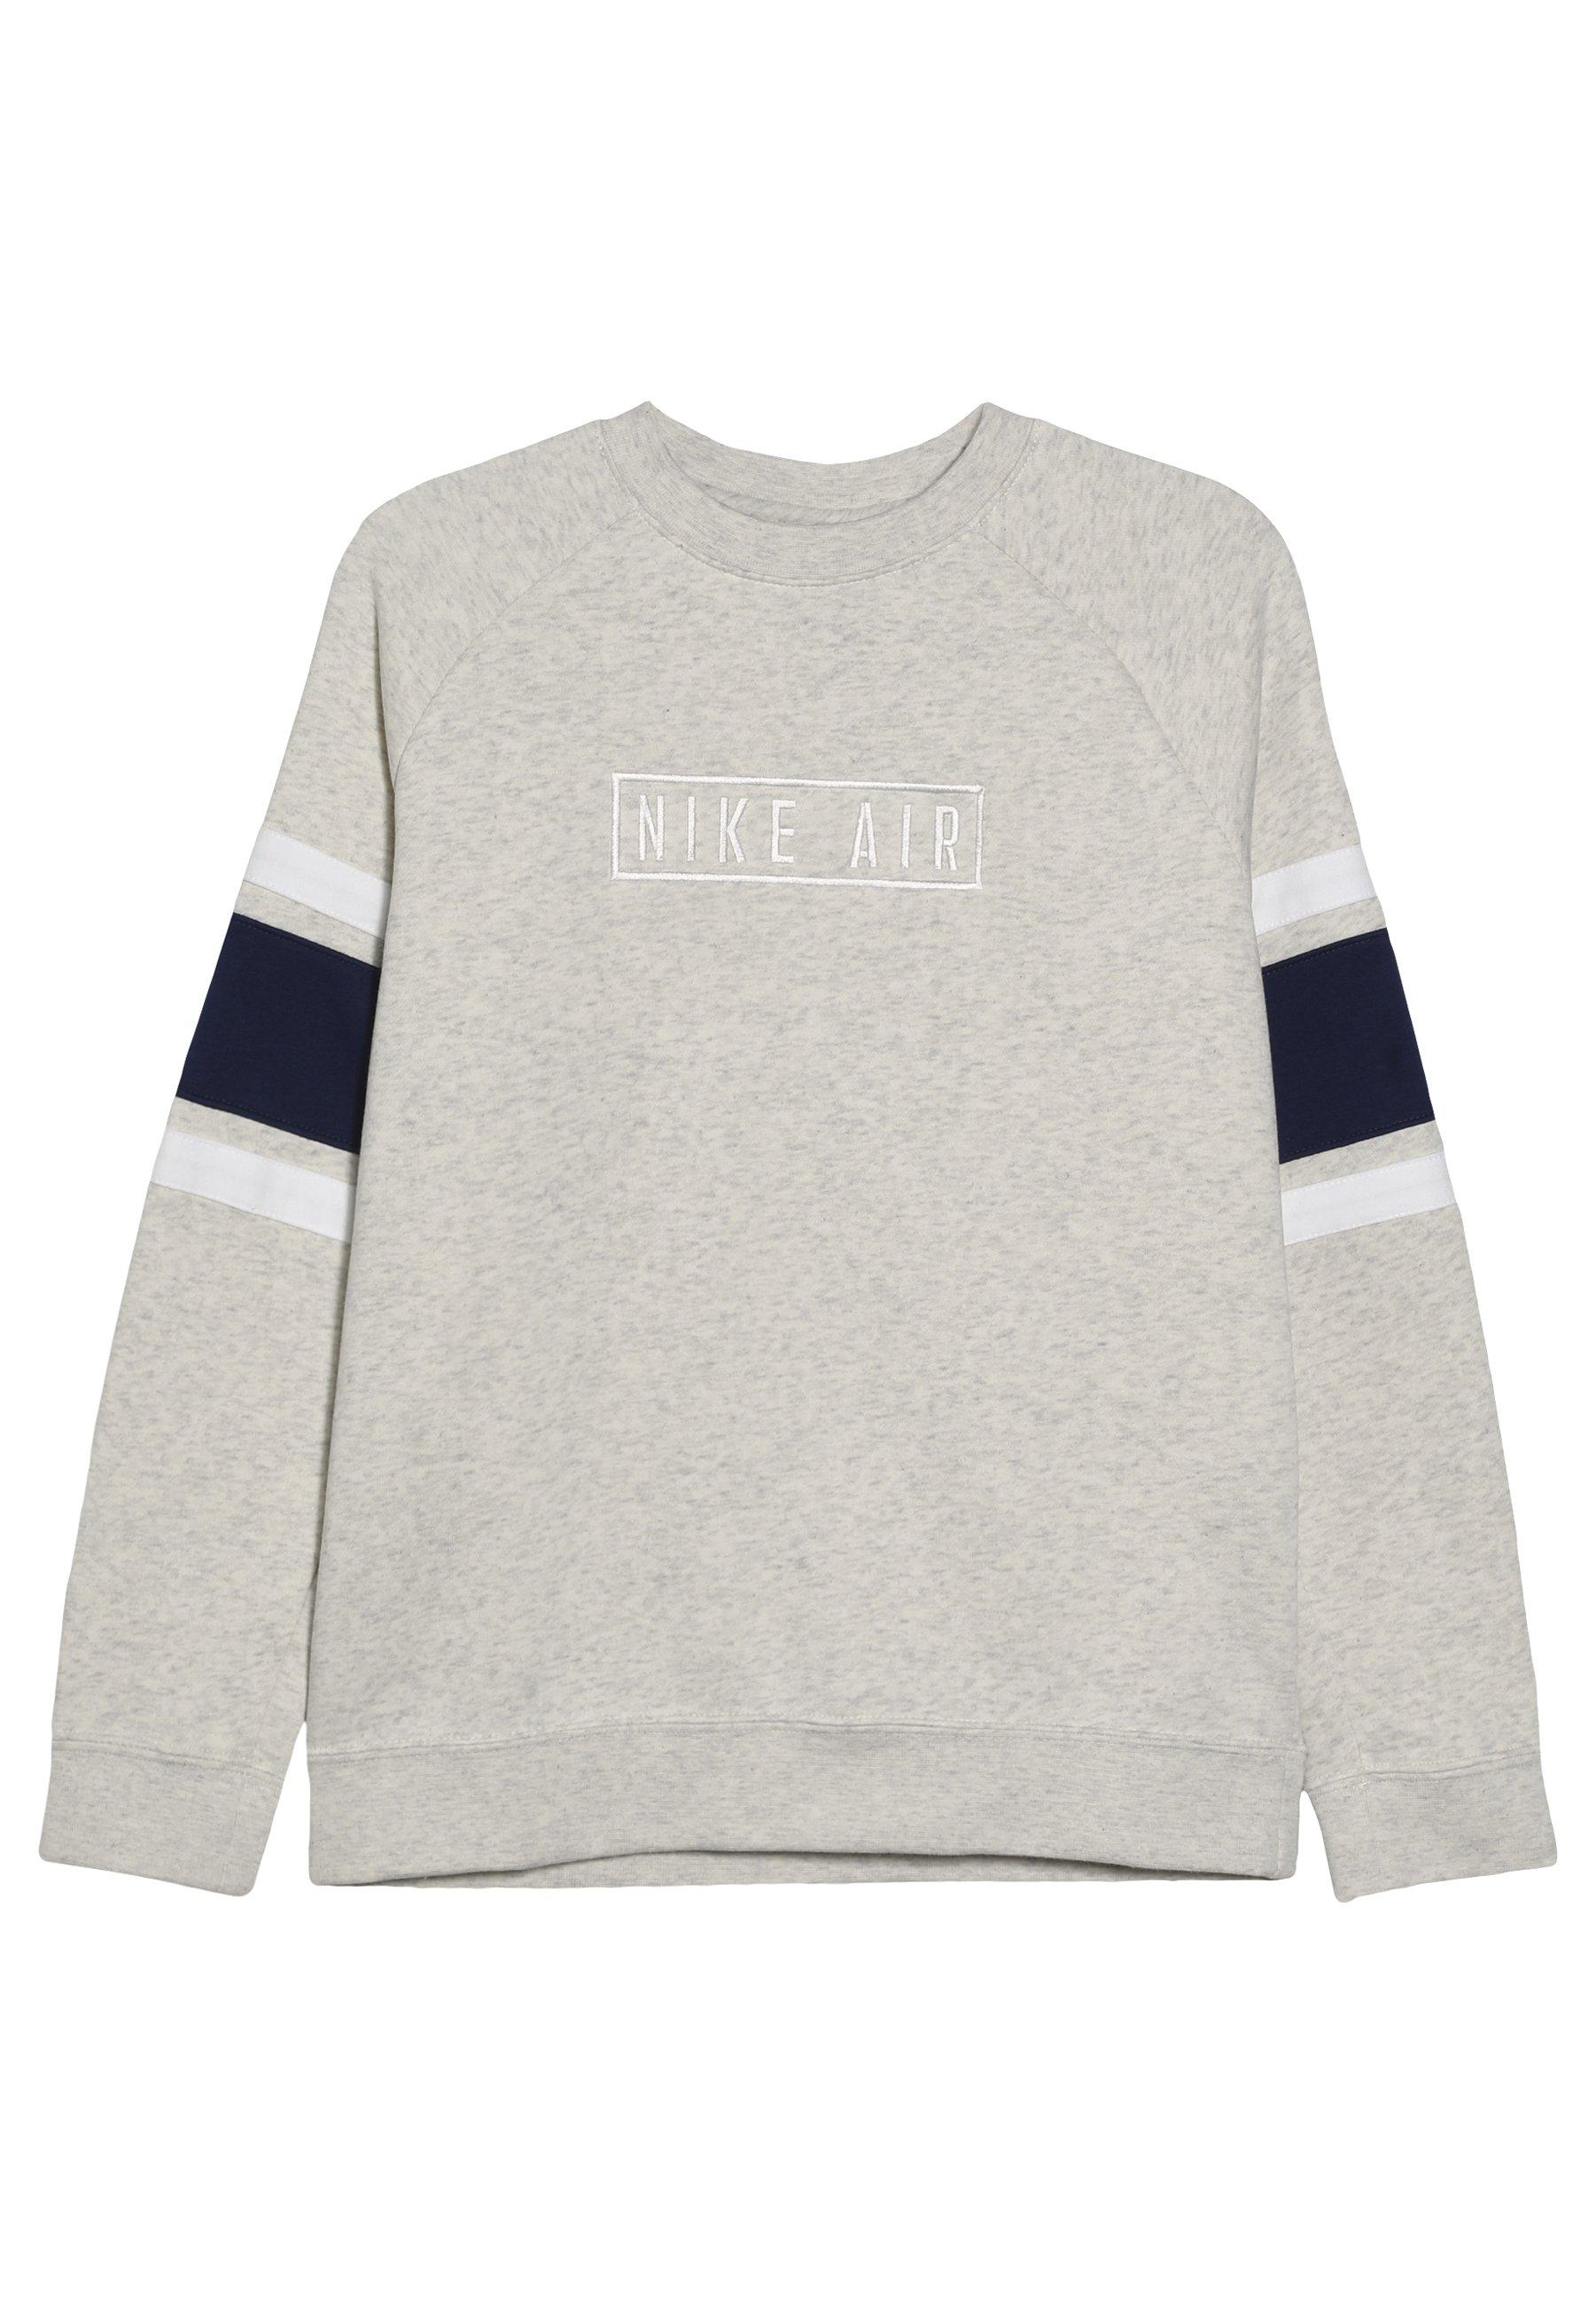 Nike Sportswear AIR CREW Sweatshirt off white Zalando.at